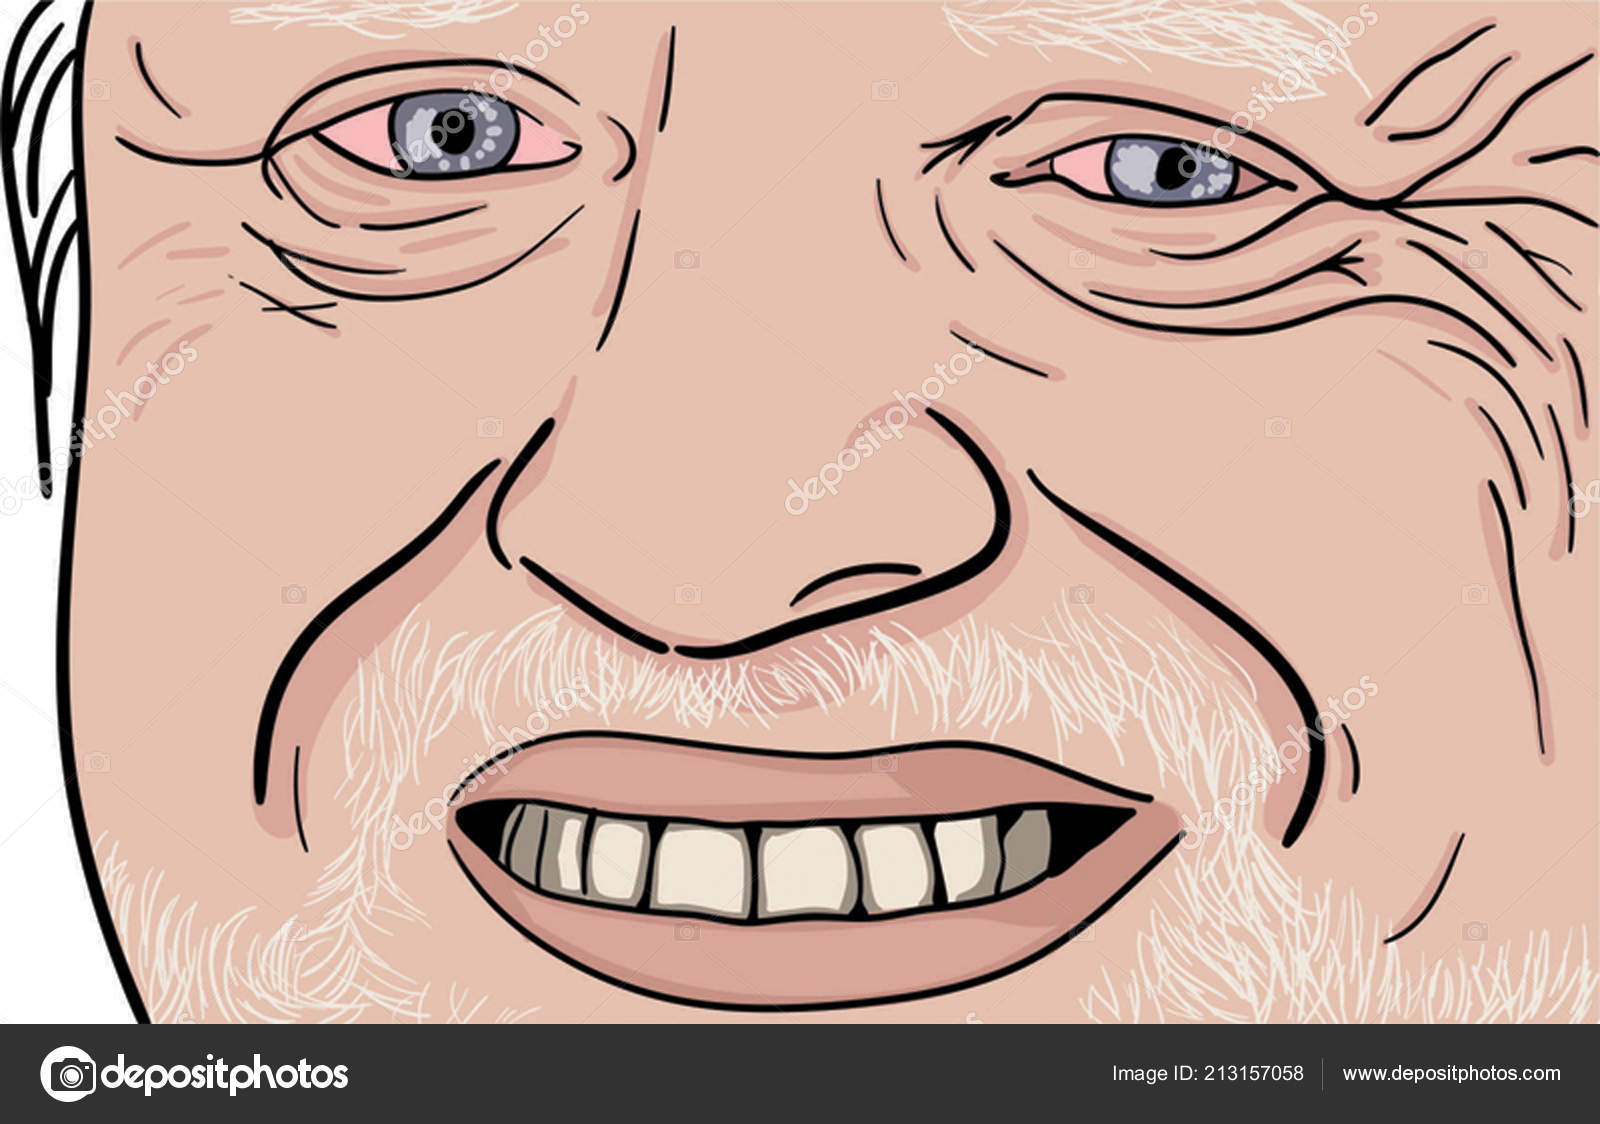 Hide The Pain Harold Tumblr